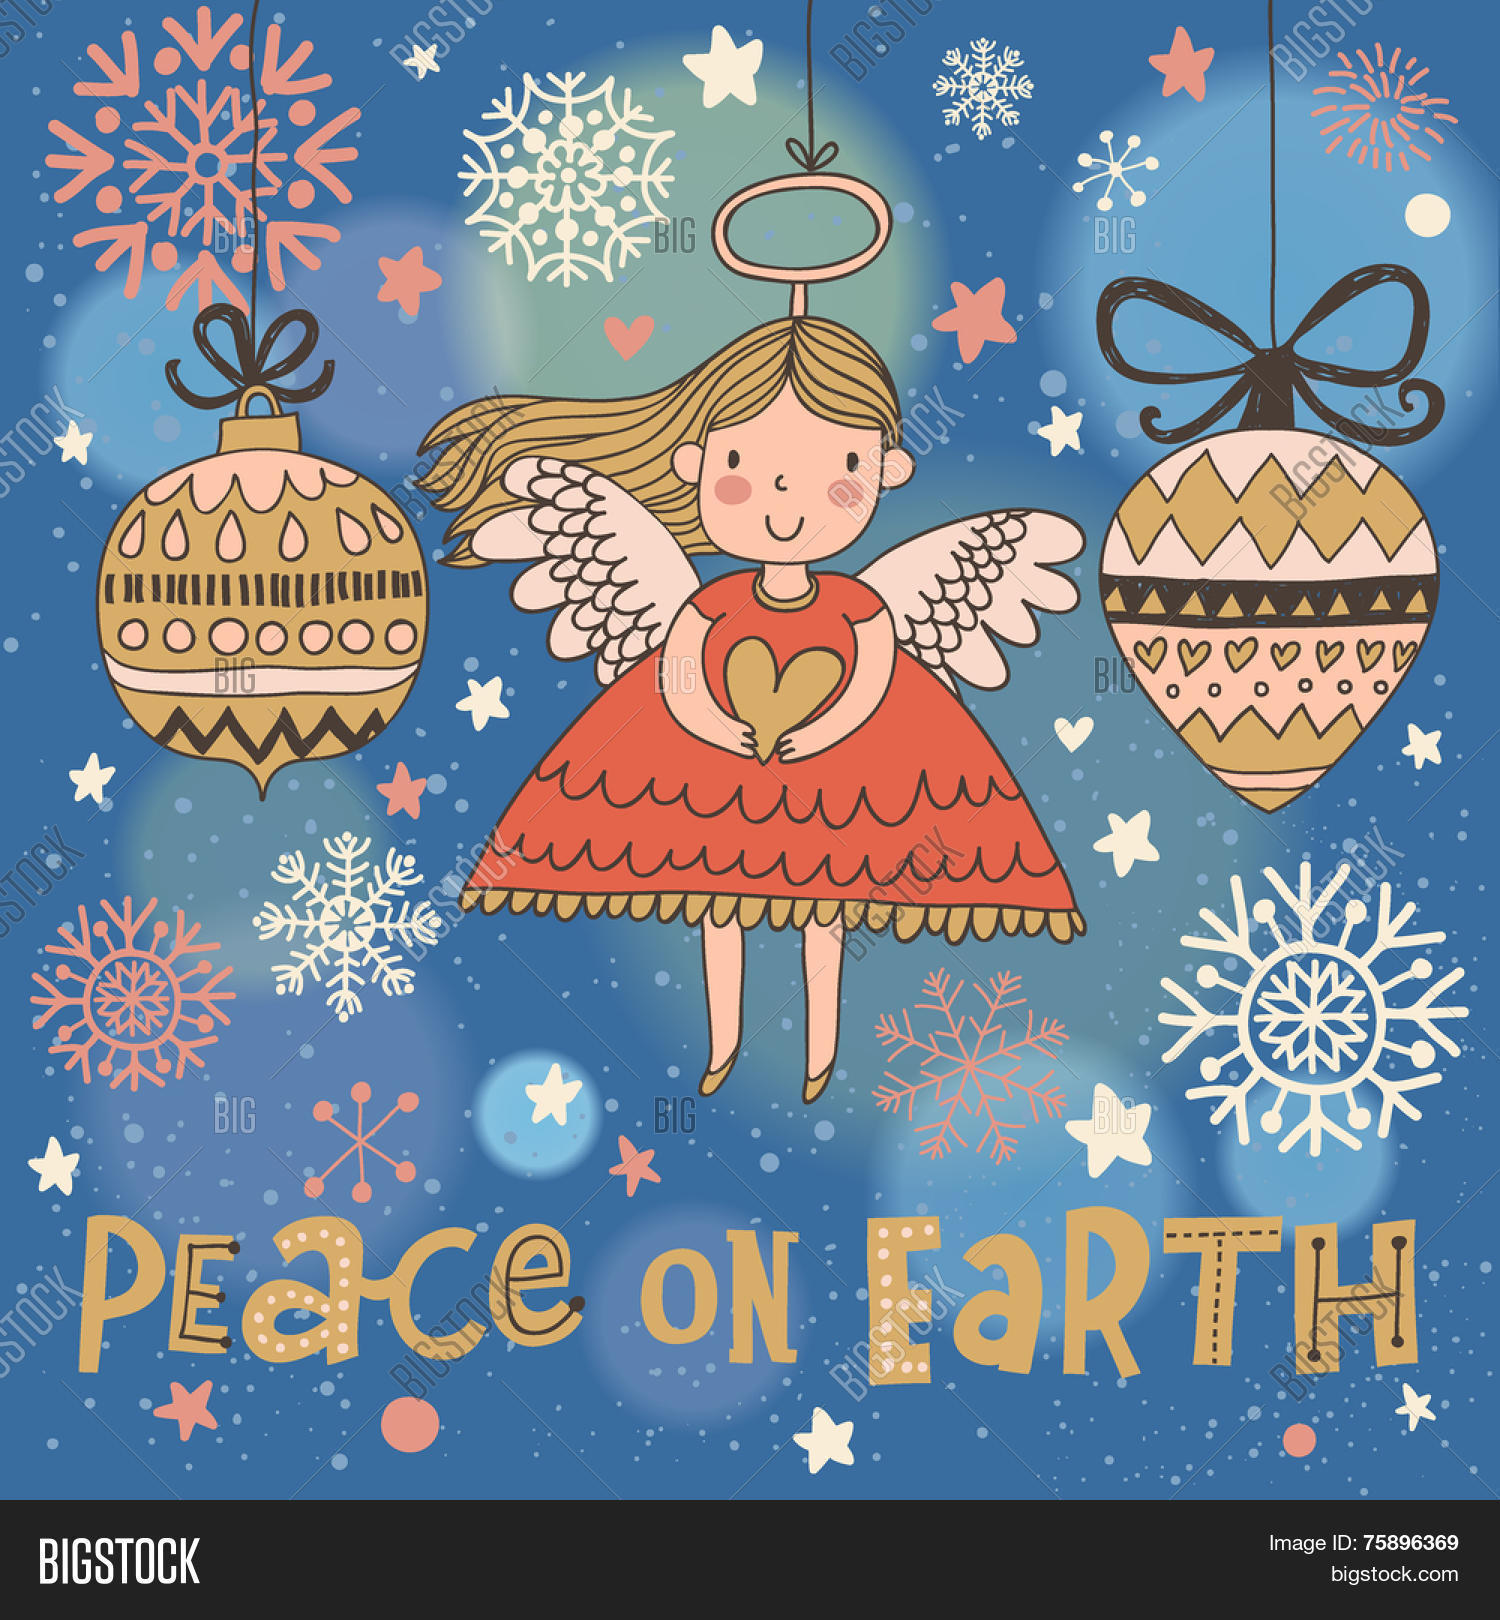 Peace On Earth. Cute Christmas Vector & Photo | Bigstock